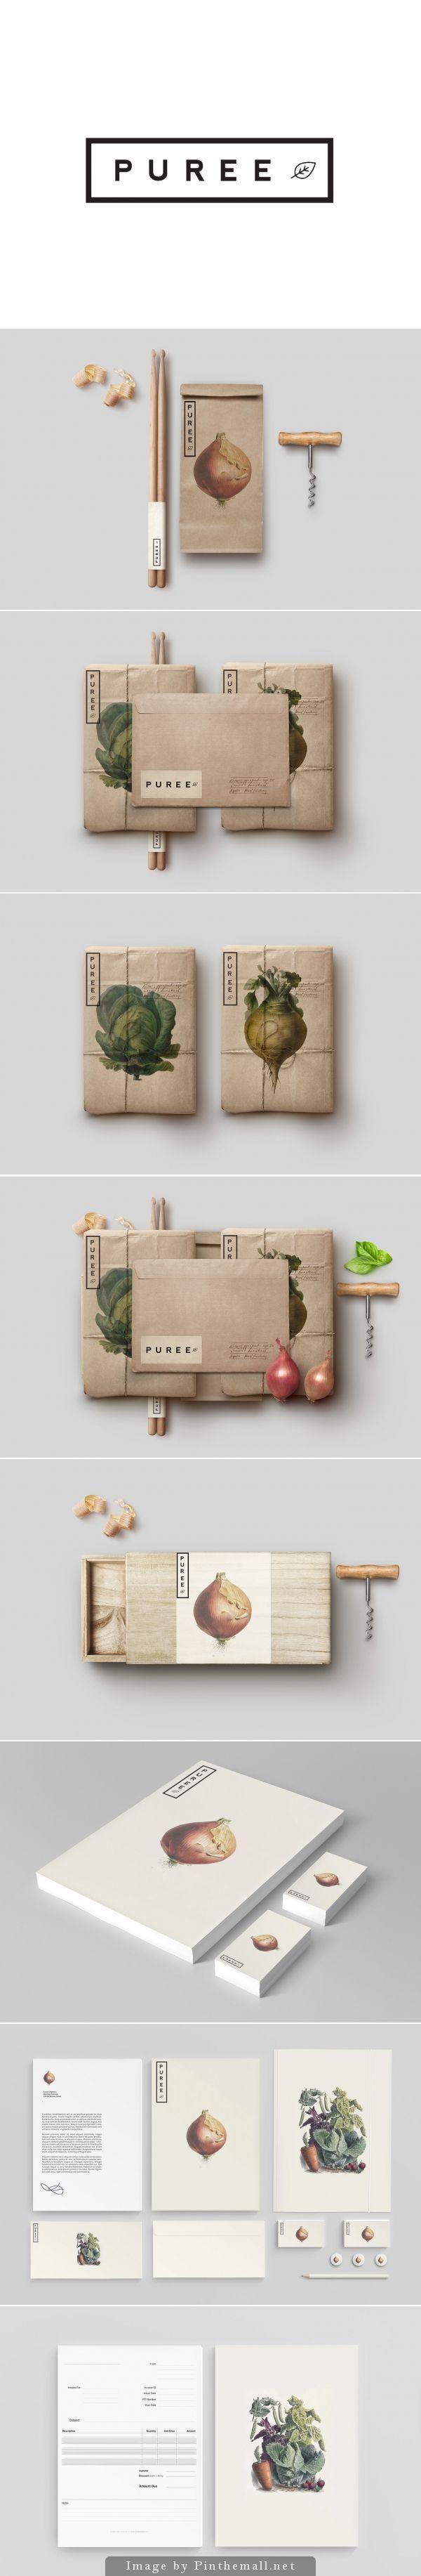 Food design by Studioahamed | Branding | Pinterest